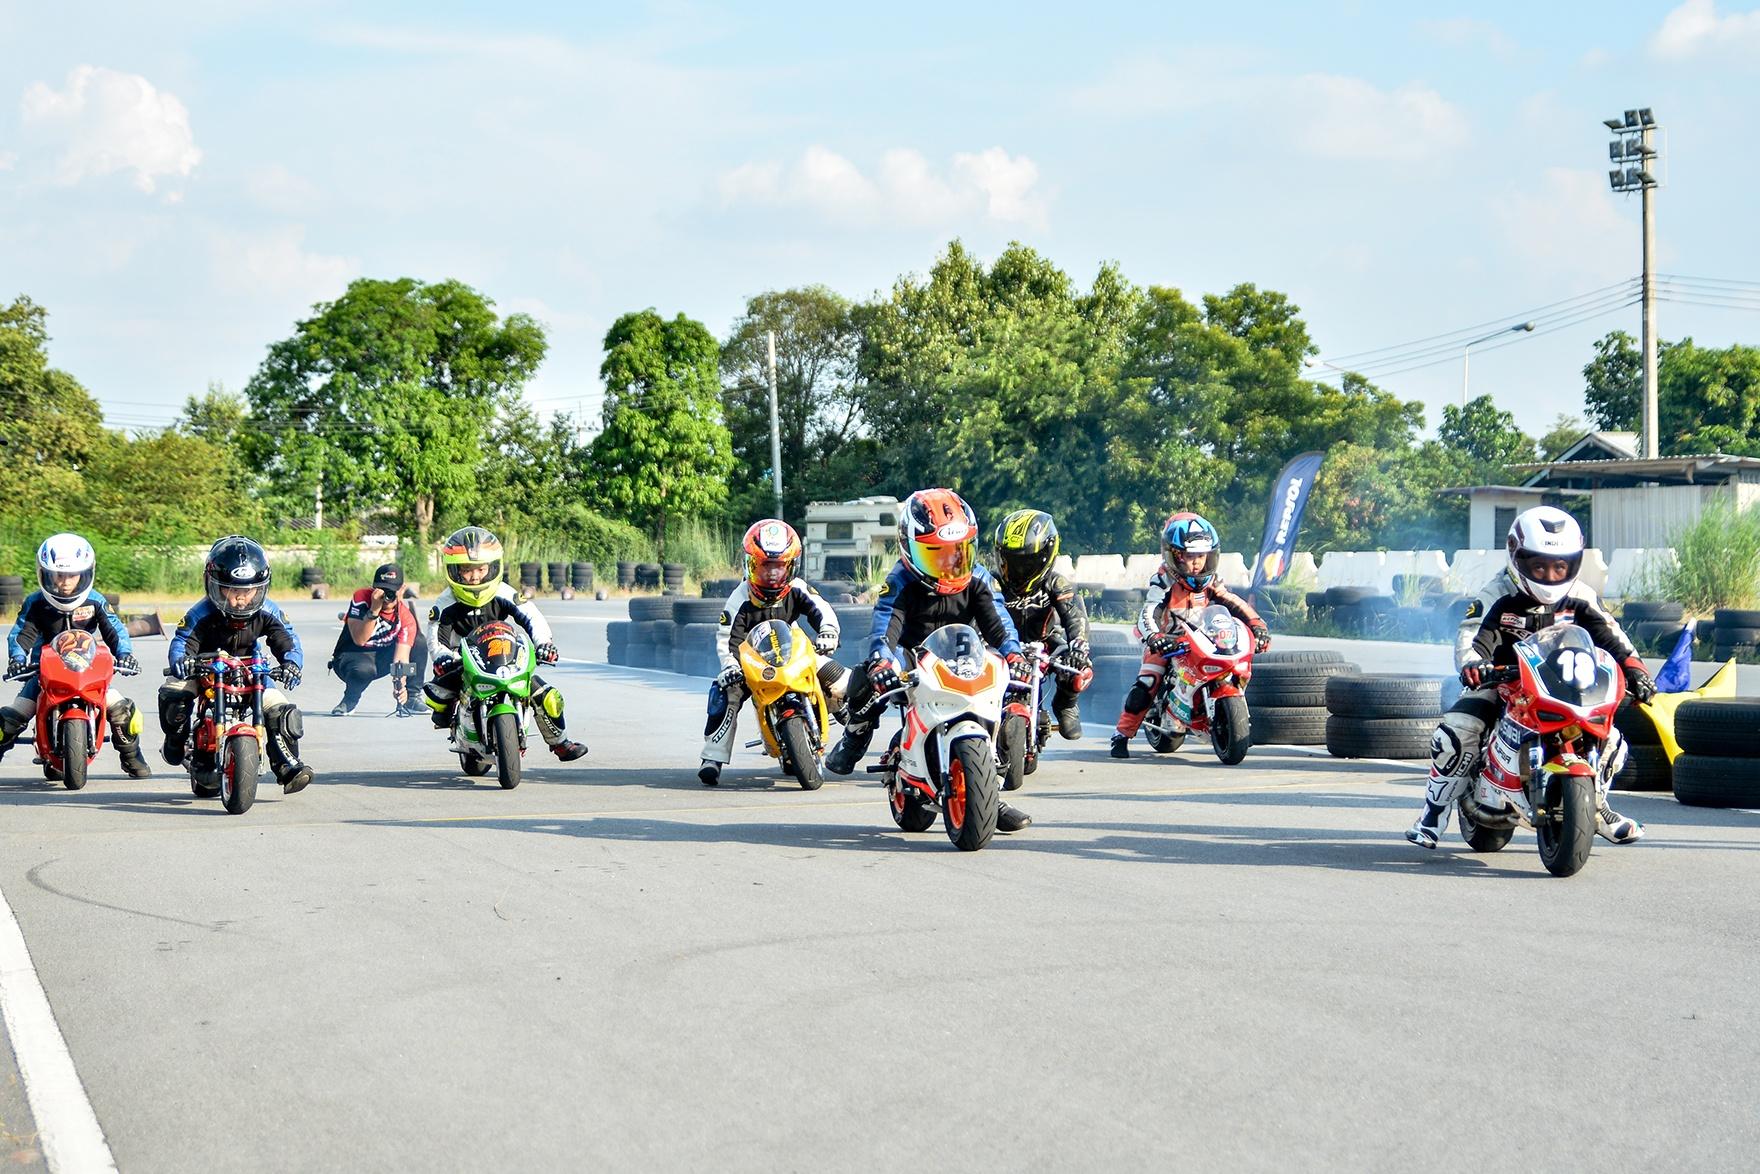 Giai dua moto tre em o Thai Lan va nhung giac mo MotoGP hinh anh 23